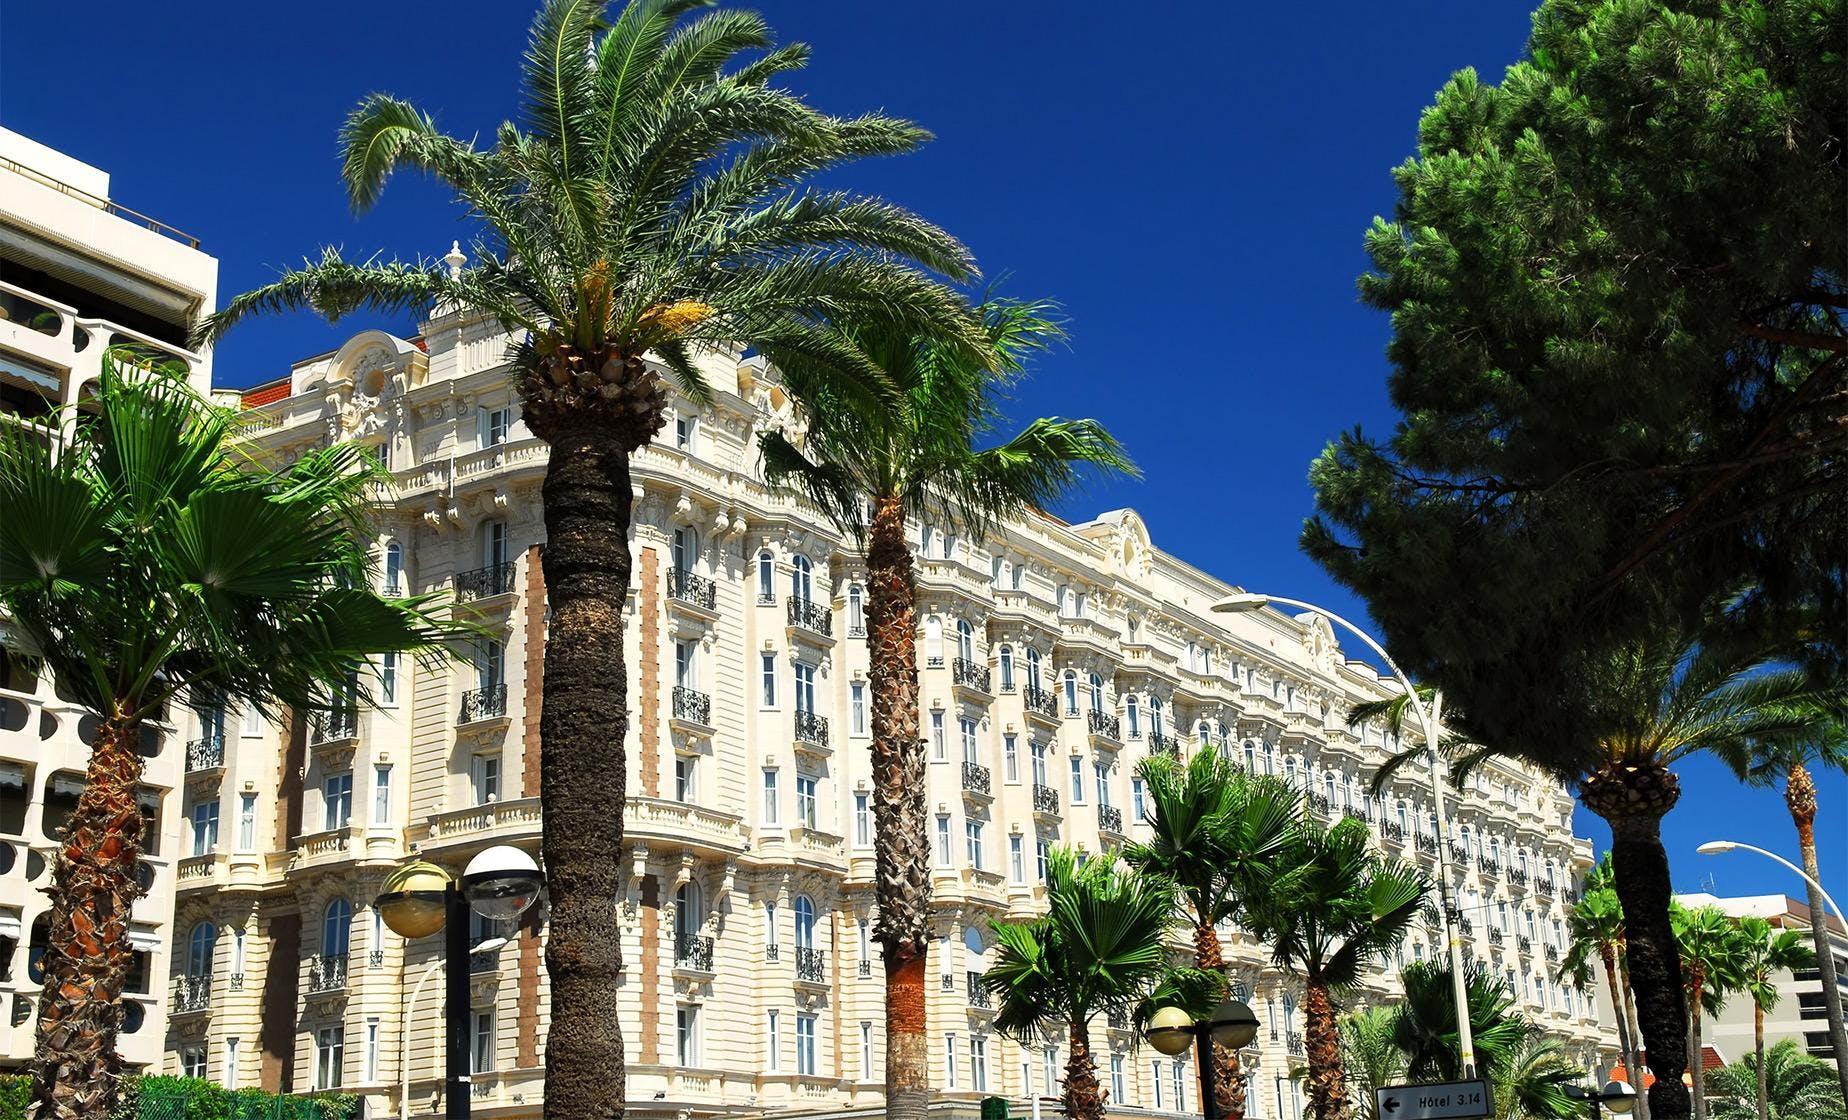 Private Cannes and St. Paul de Vence